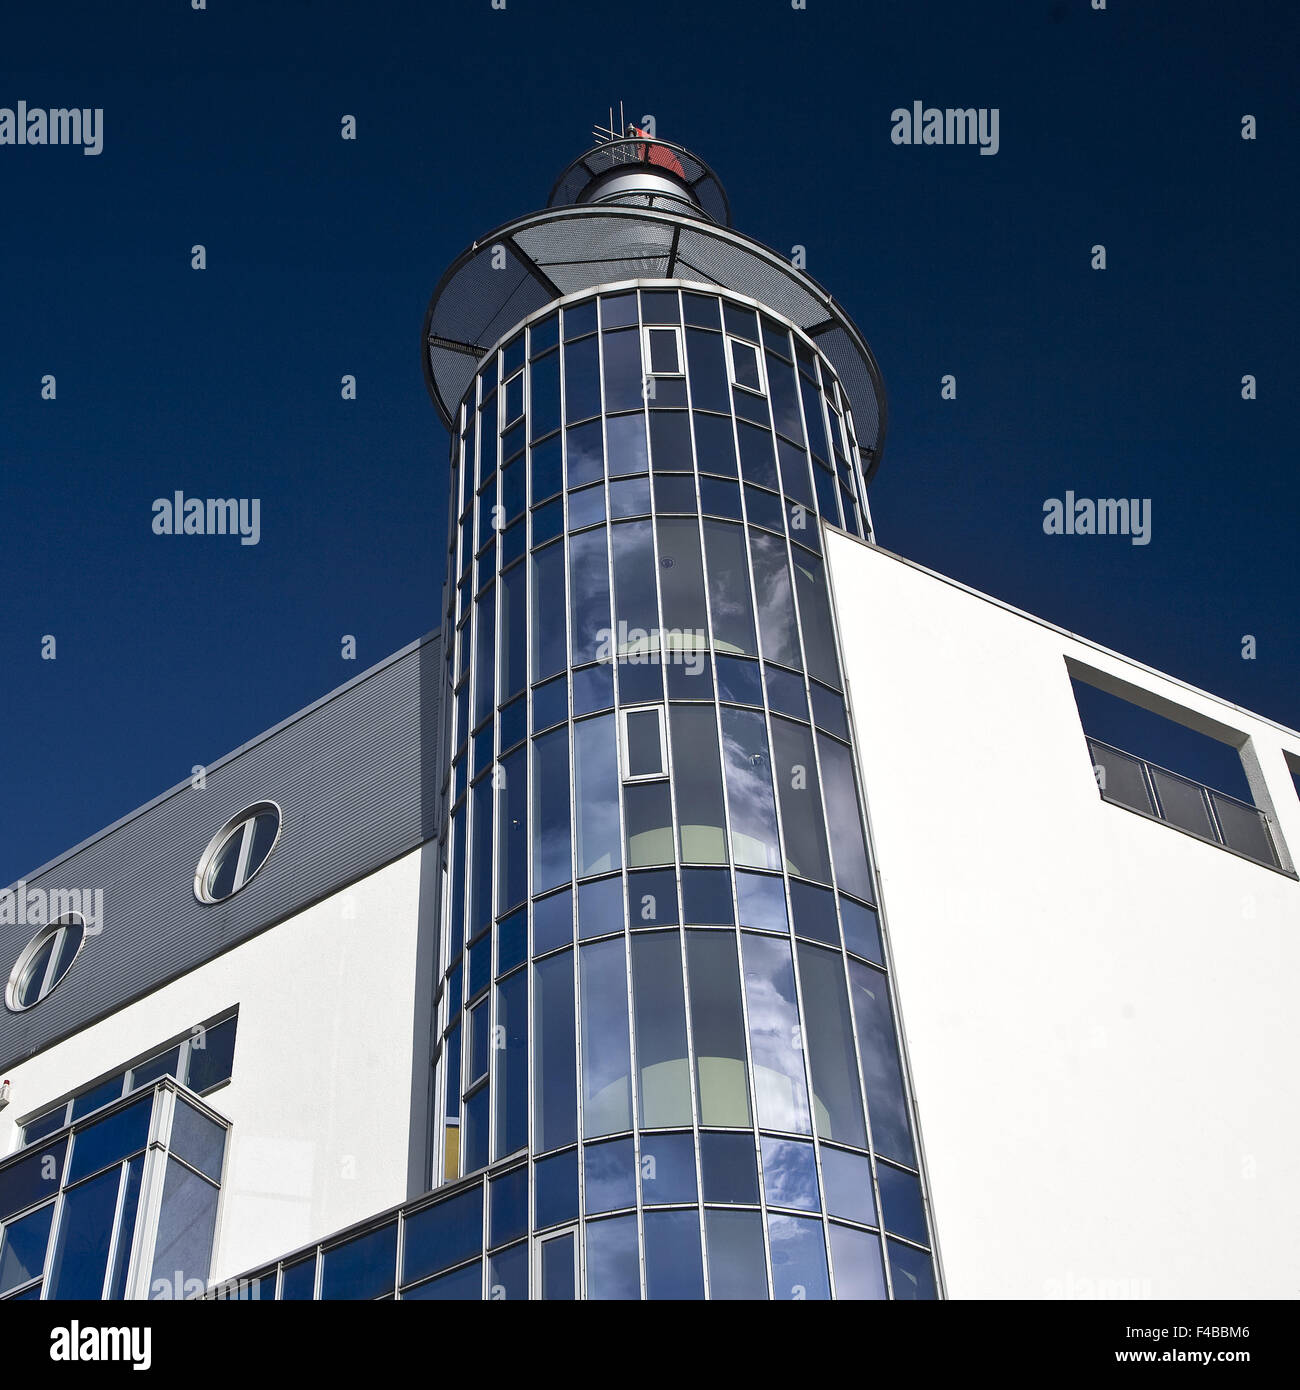 La arquitectura moderna, Dortmund, Alemania. Imagen De Stock